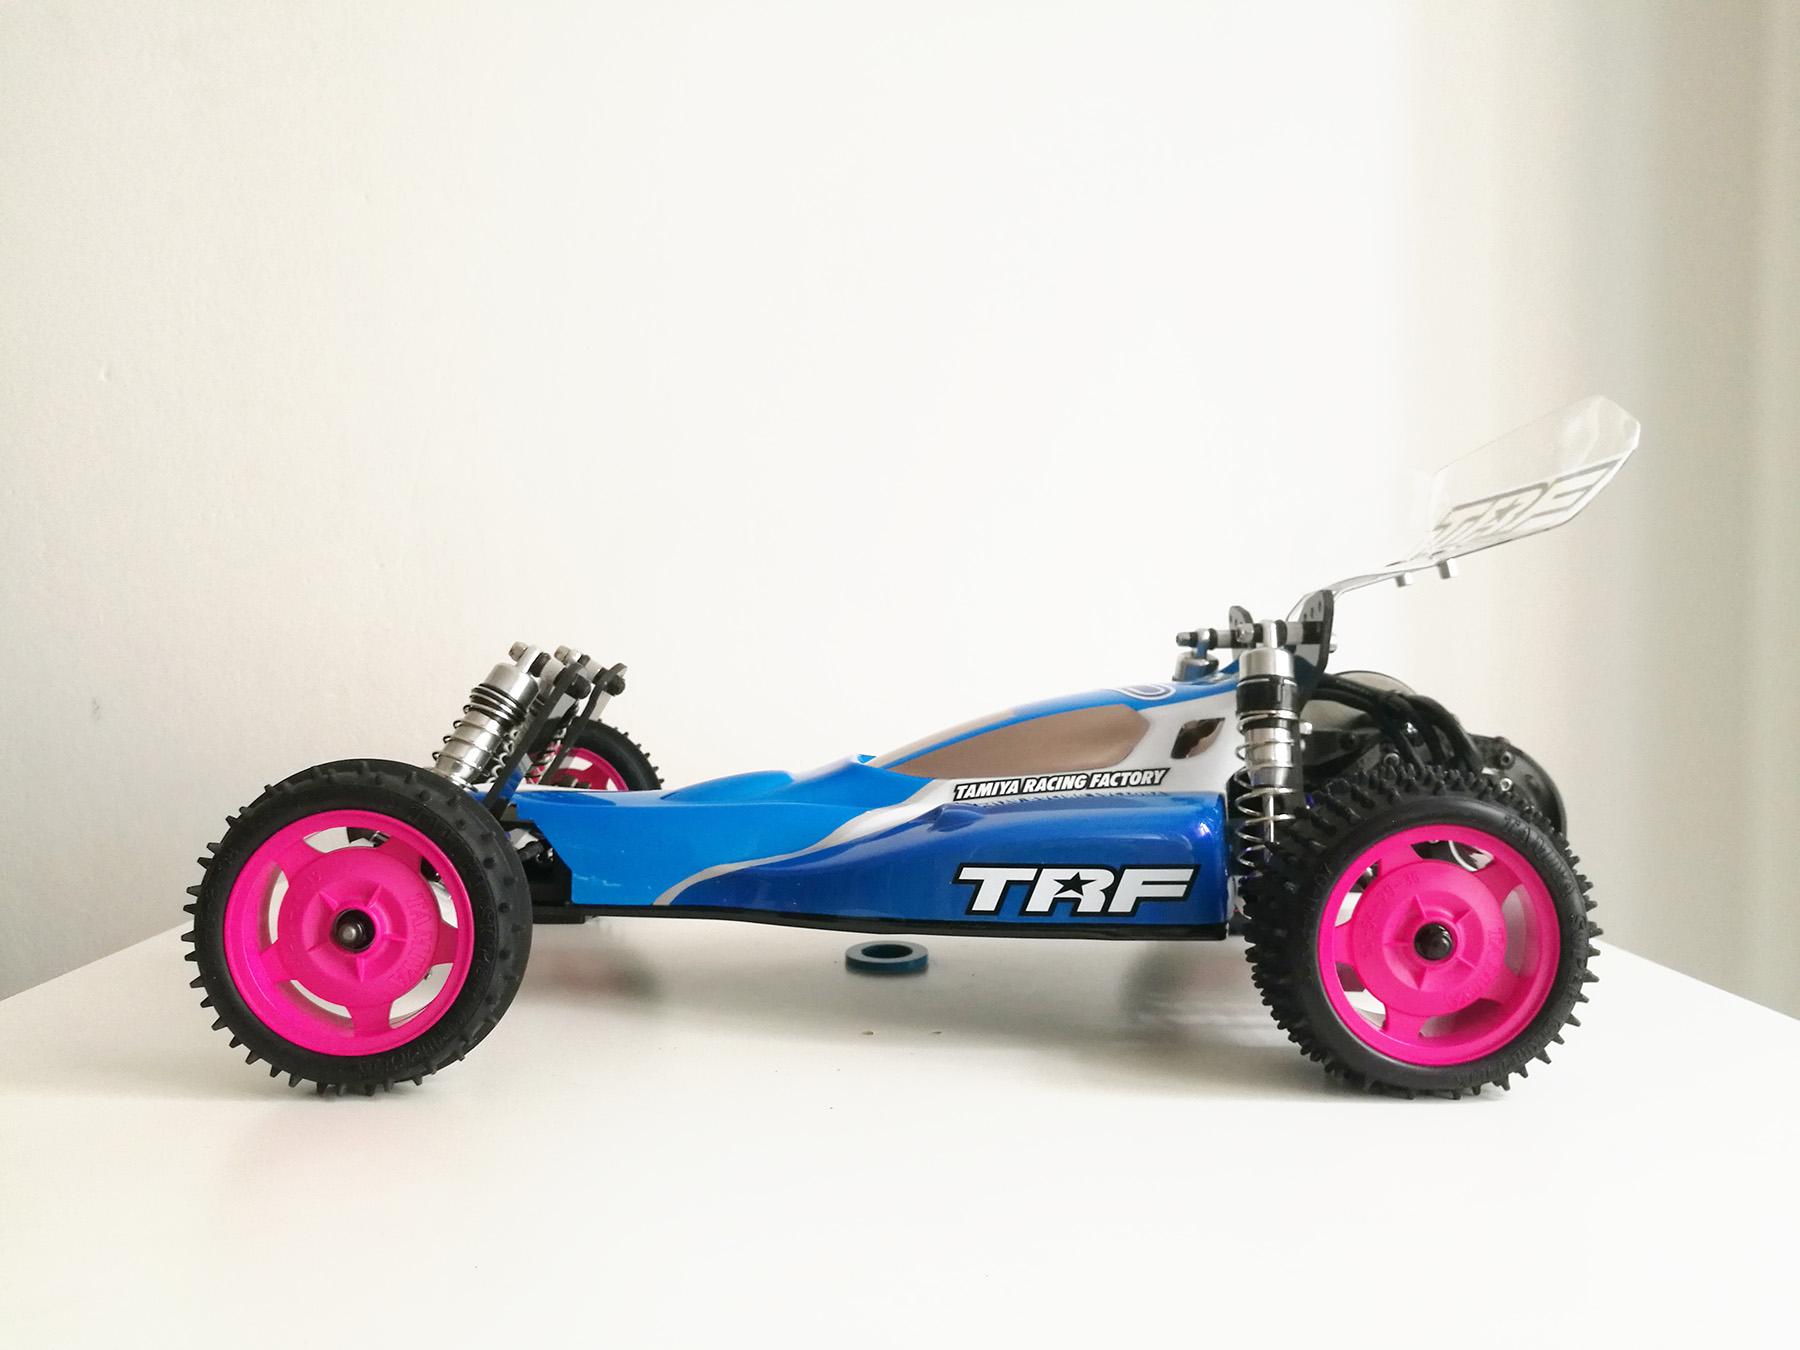 tamiya wrenchdog dyna storm ralph lee trf211x tribute car